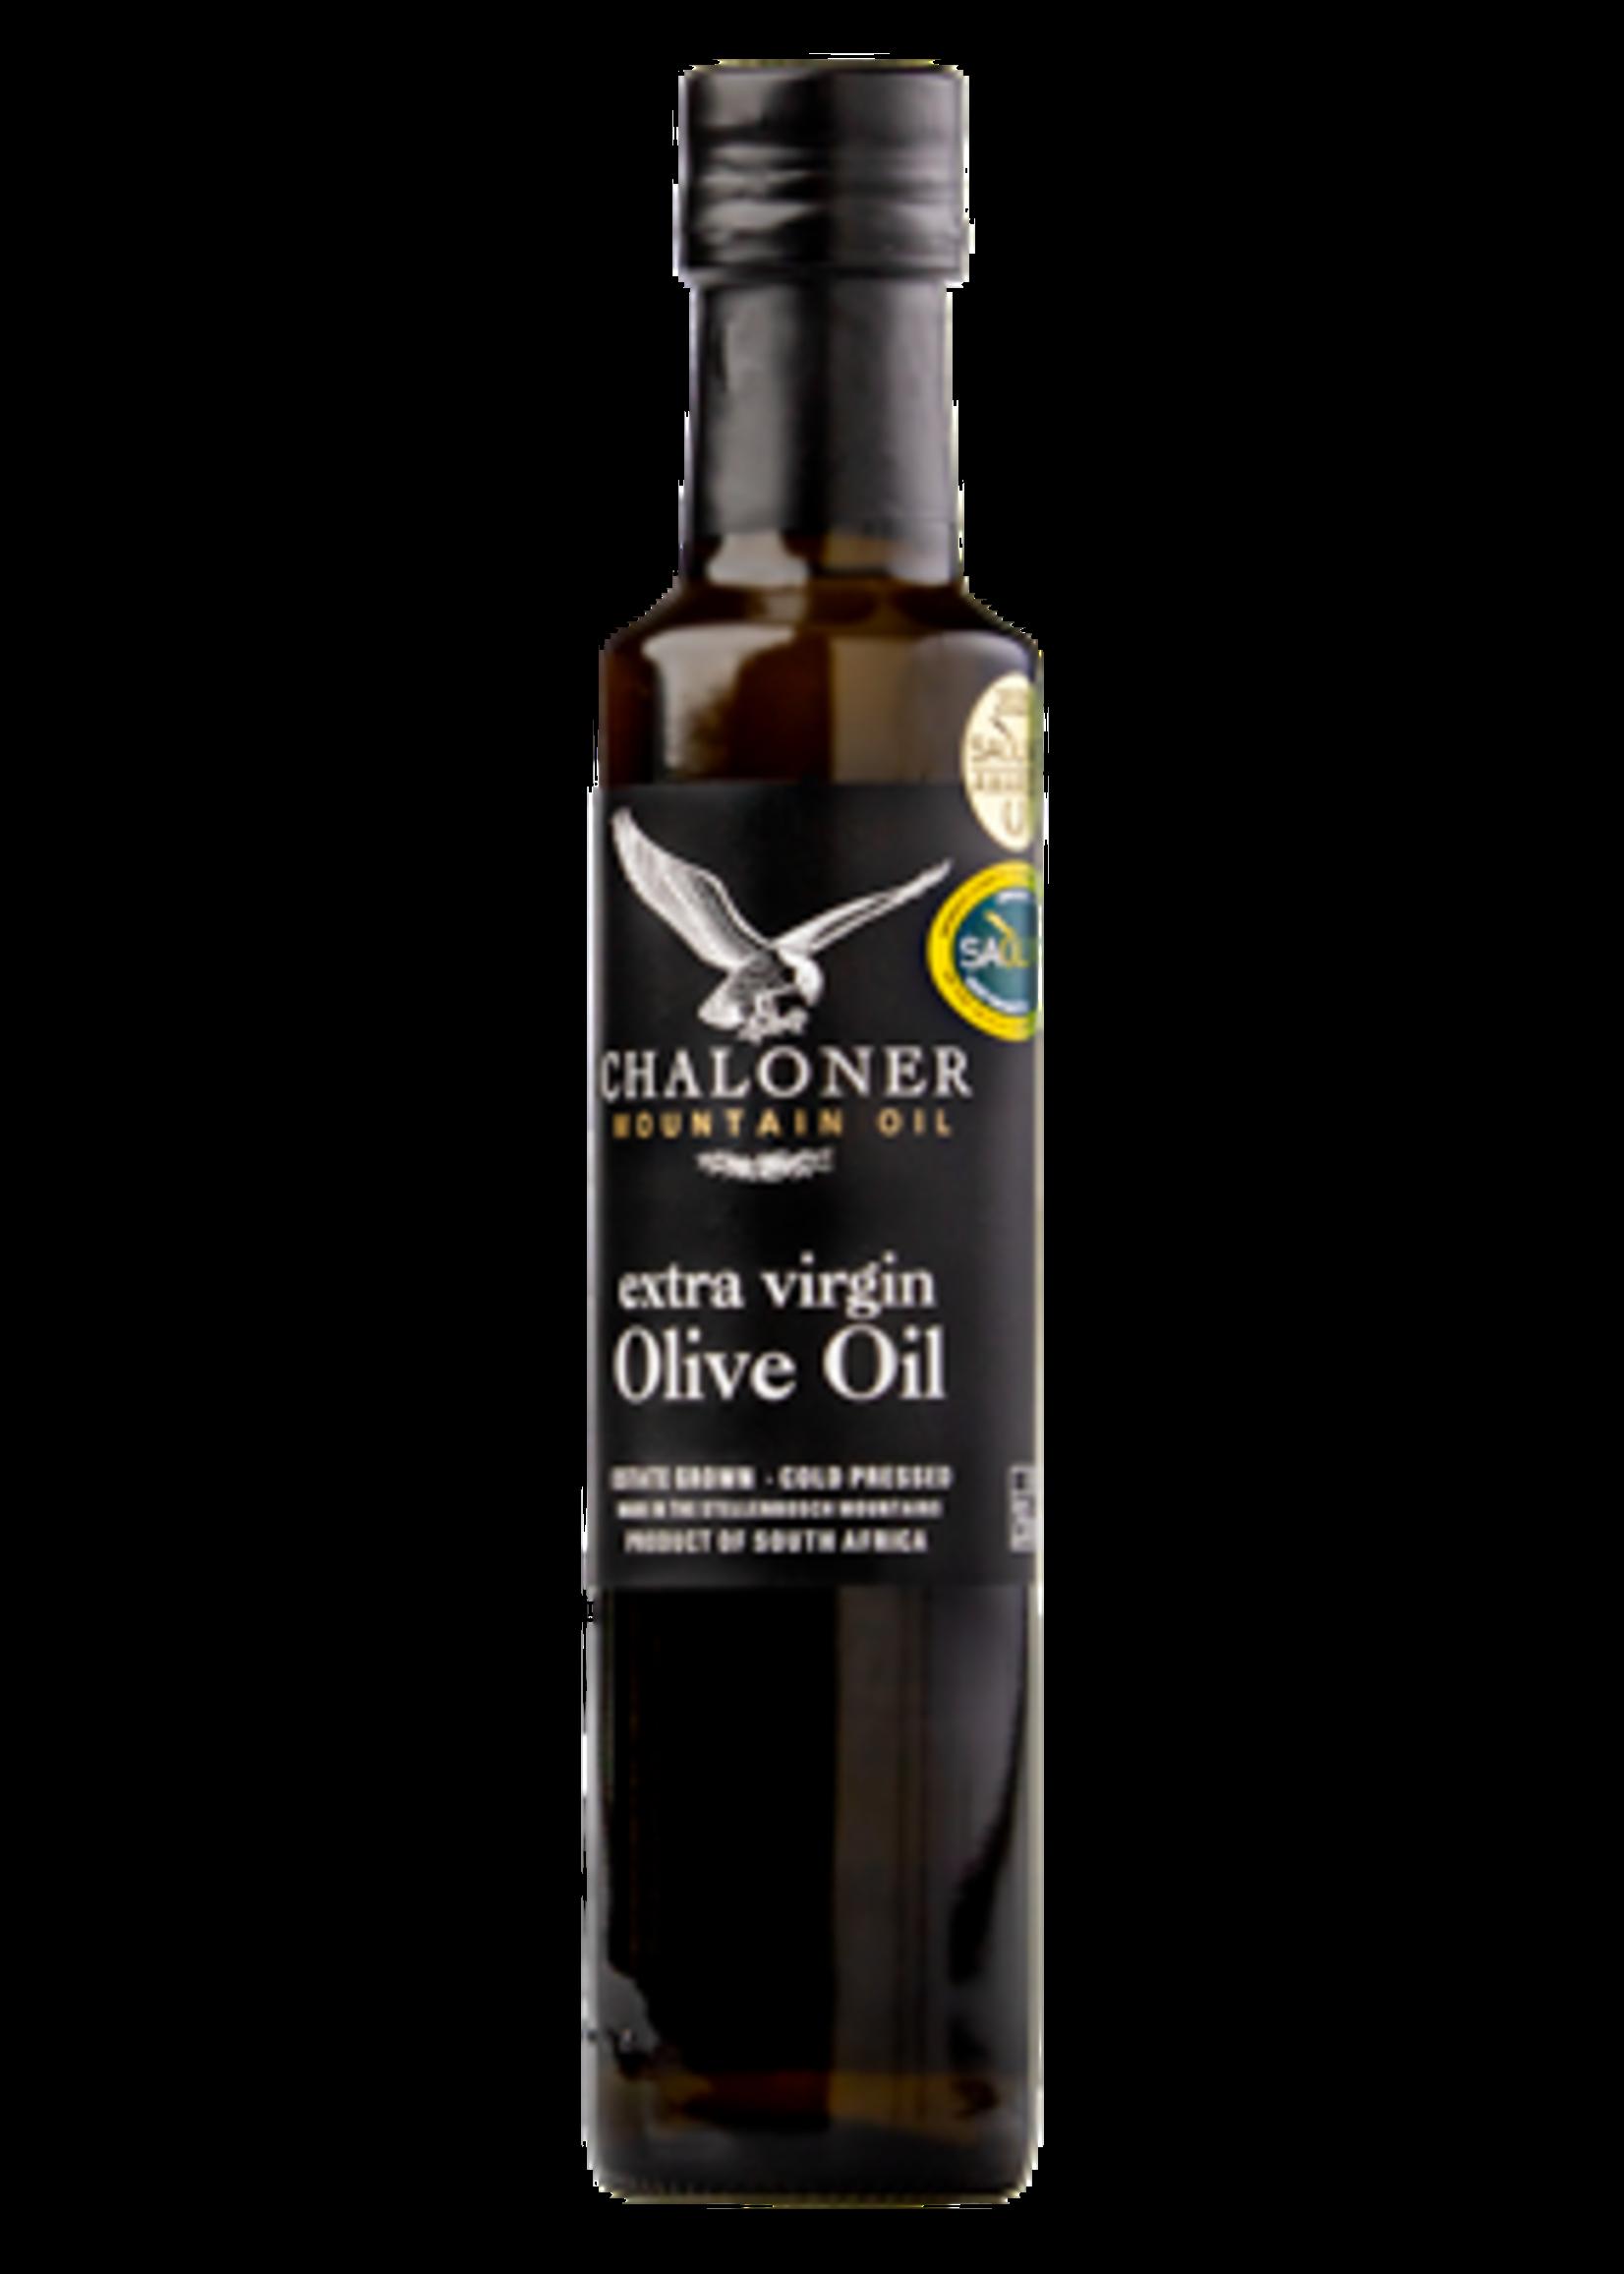 Chaloner Chaloner - Extra virgin olive oil